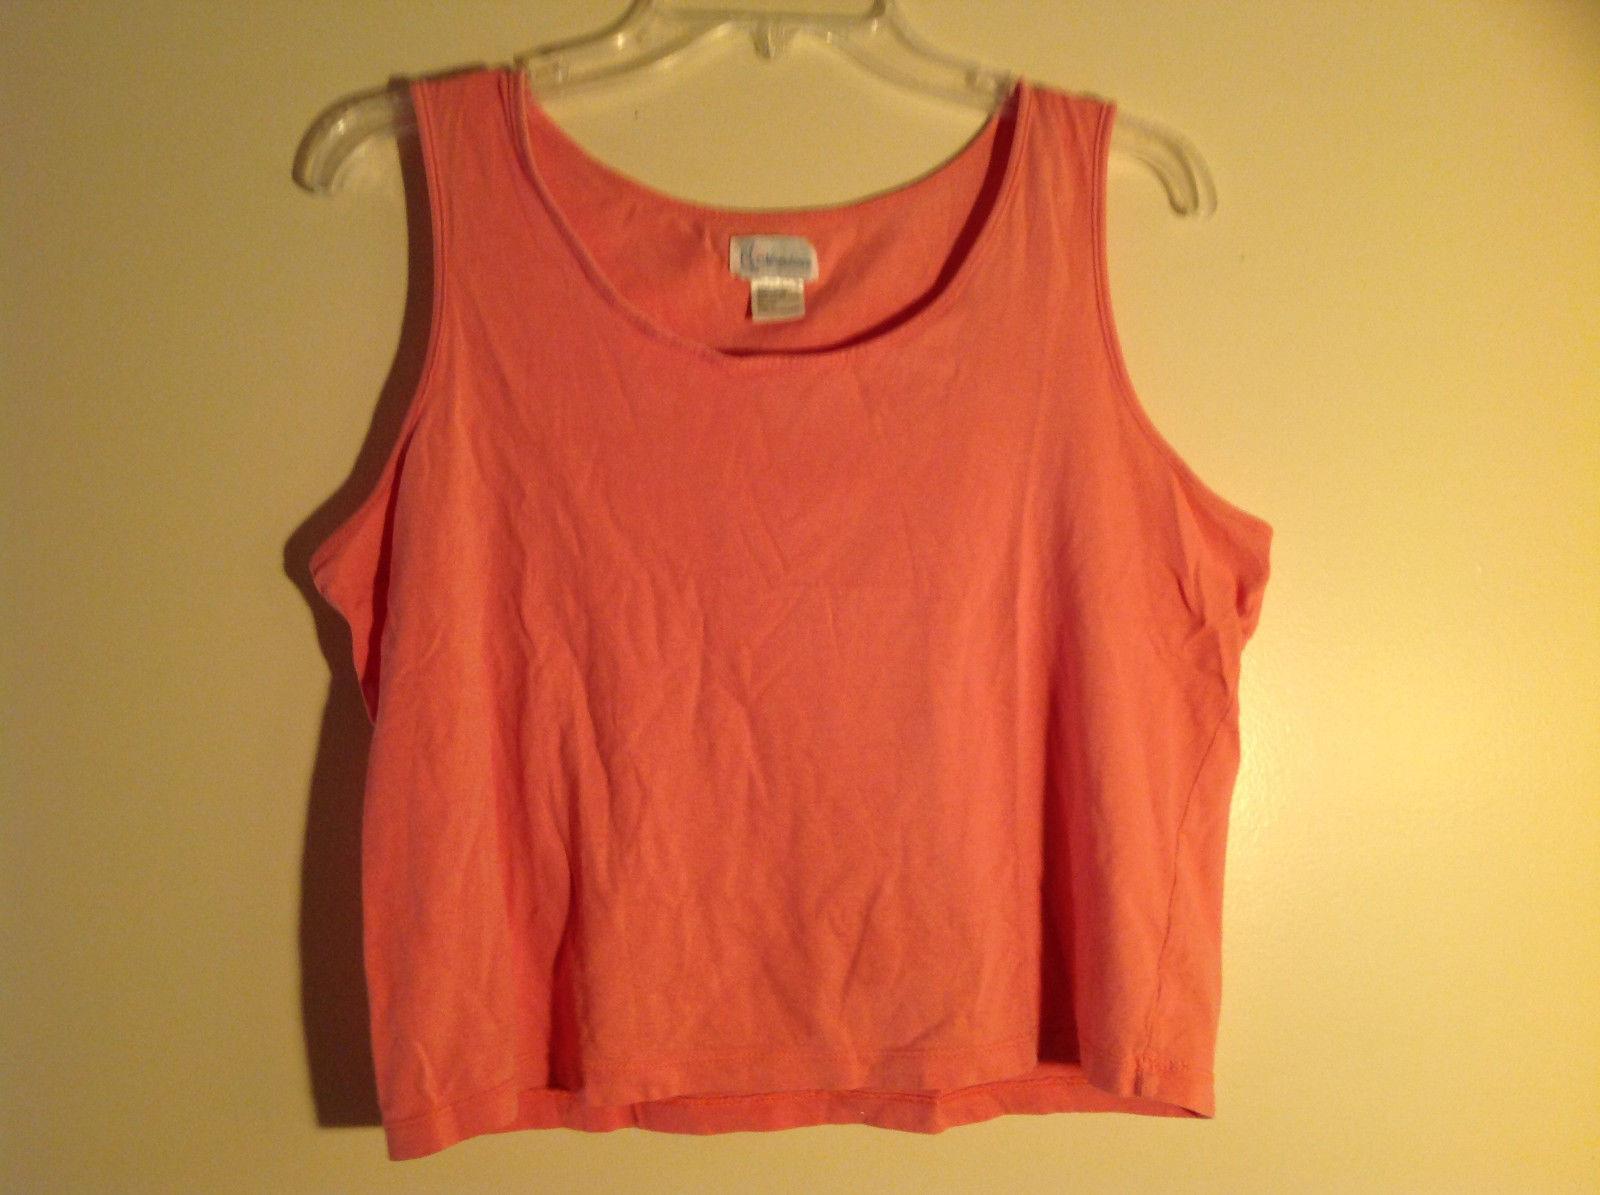 Moondance Pink Tank Top Wide Neckline Shirt Size Large